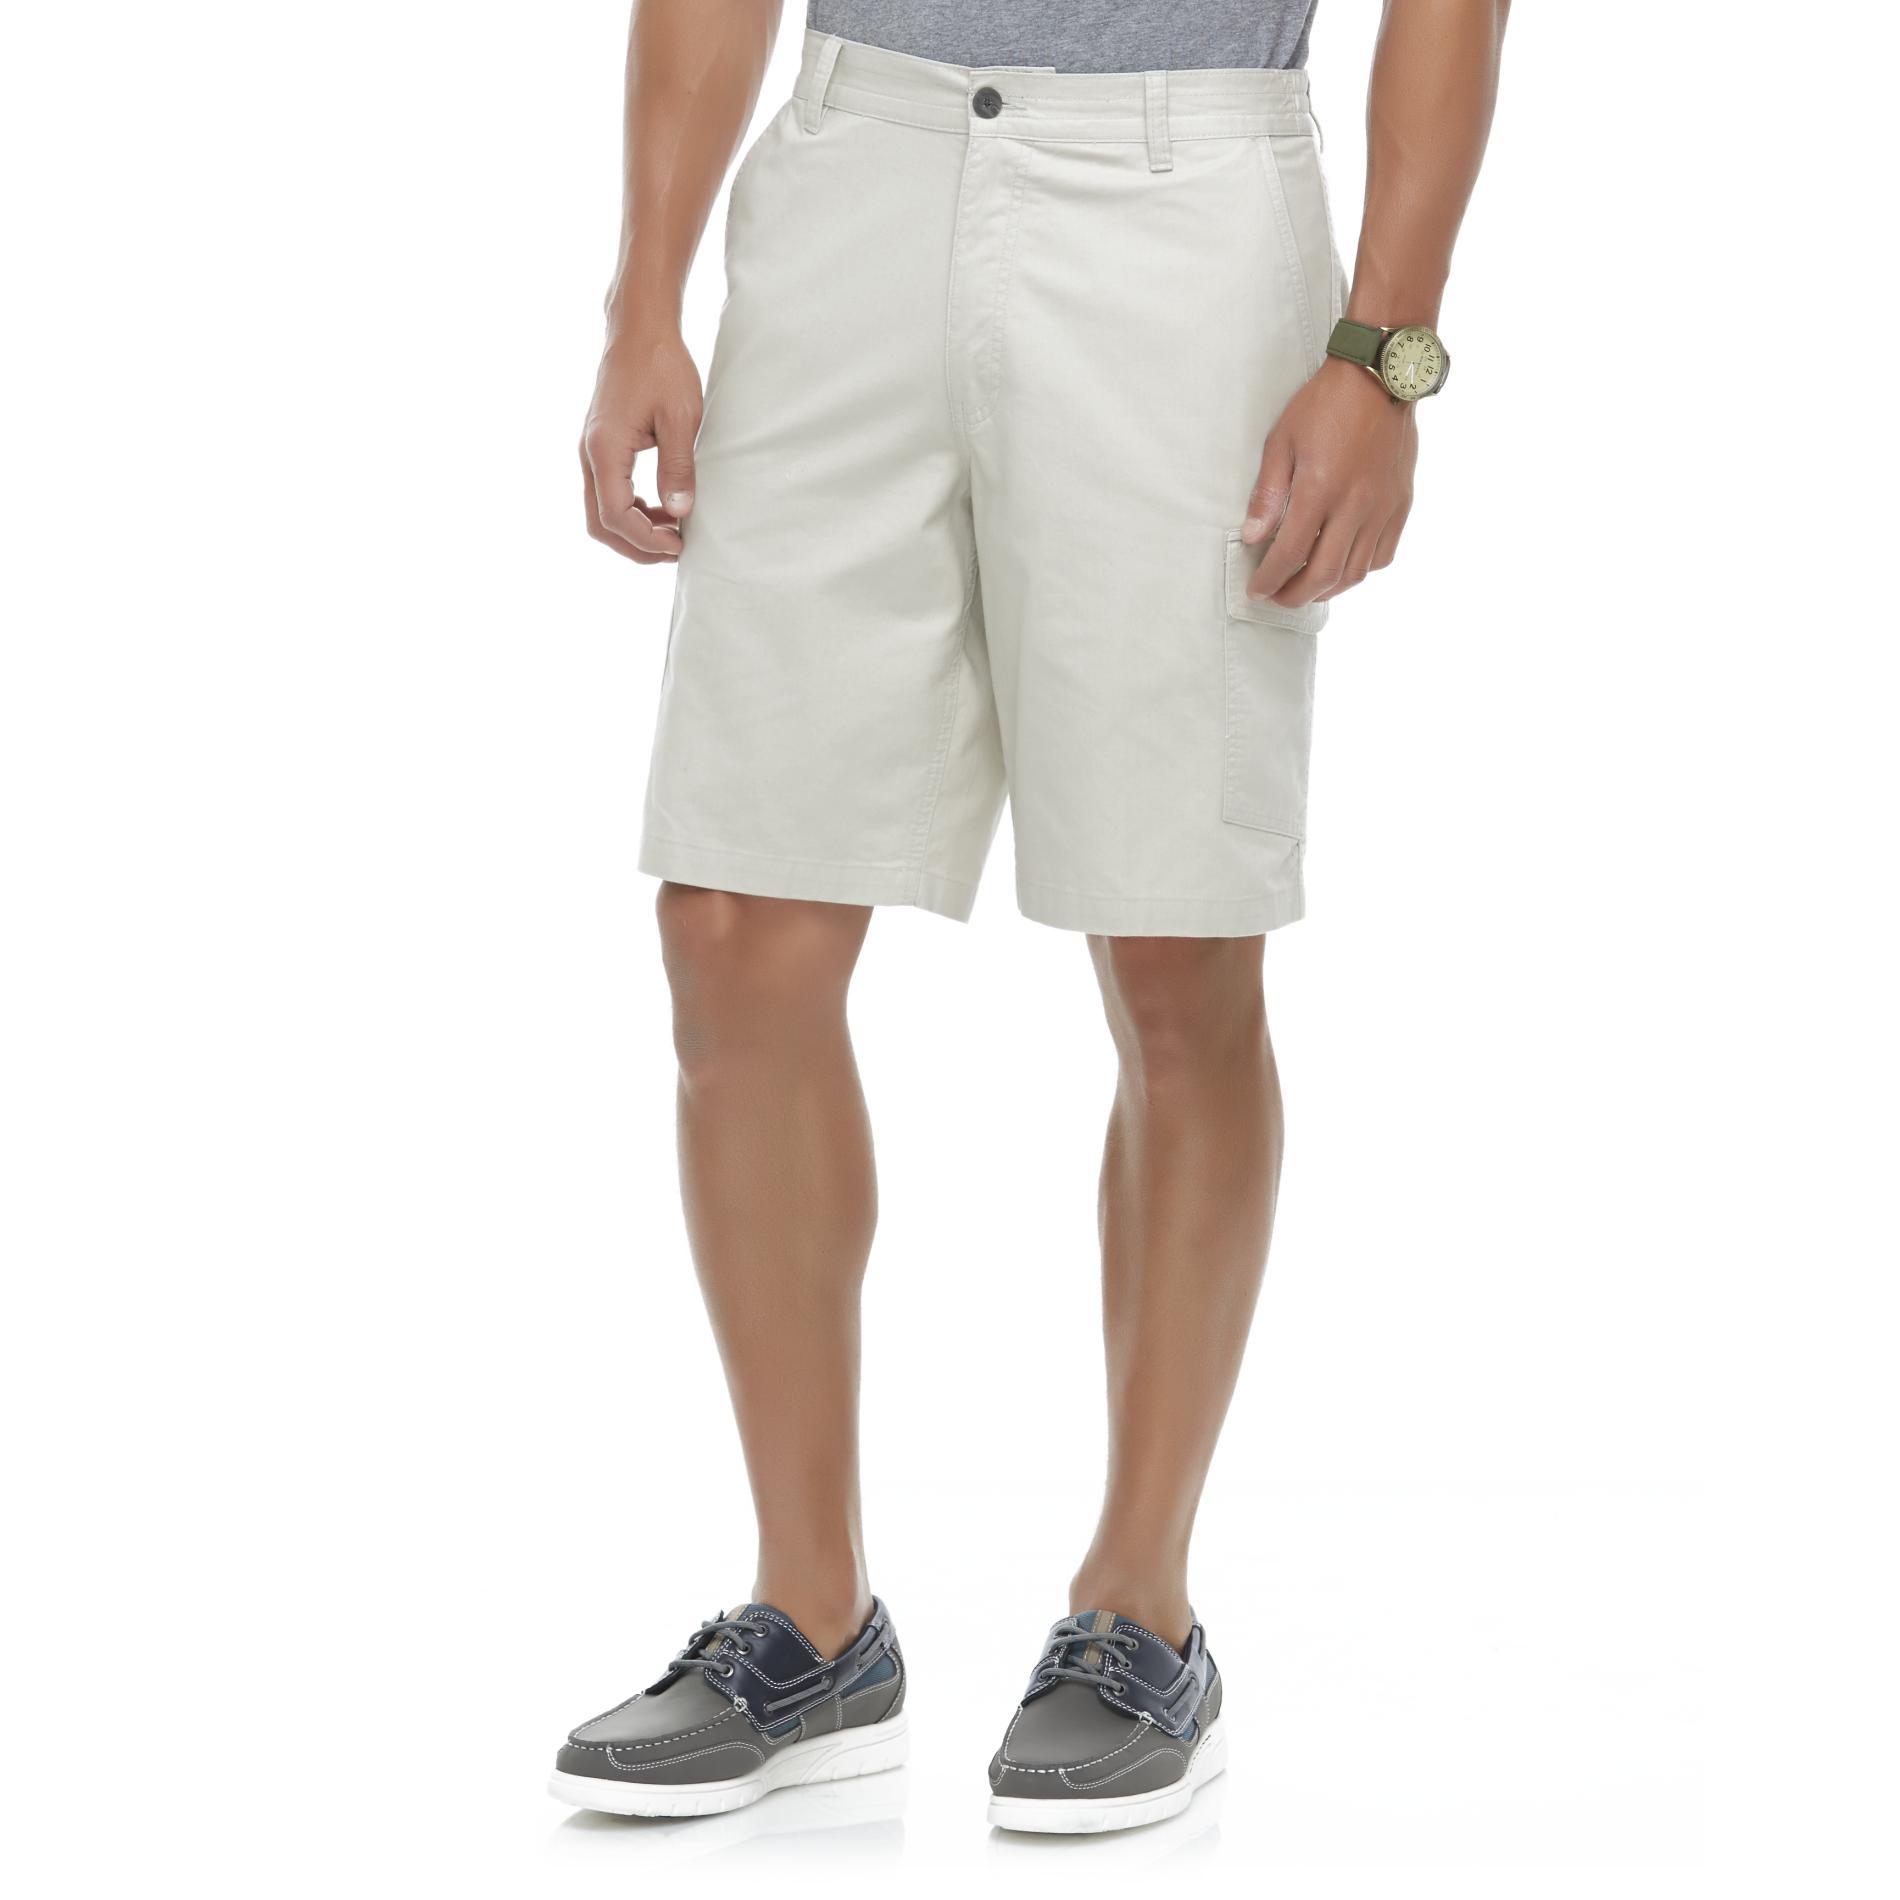 Basic Editions Men's Cargo Shorts - Herringbone